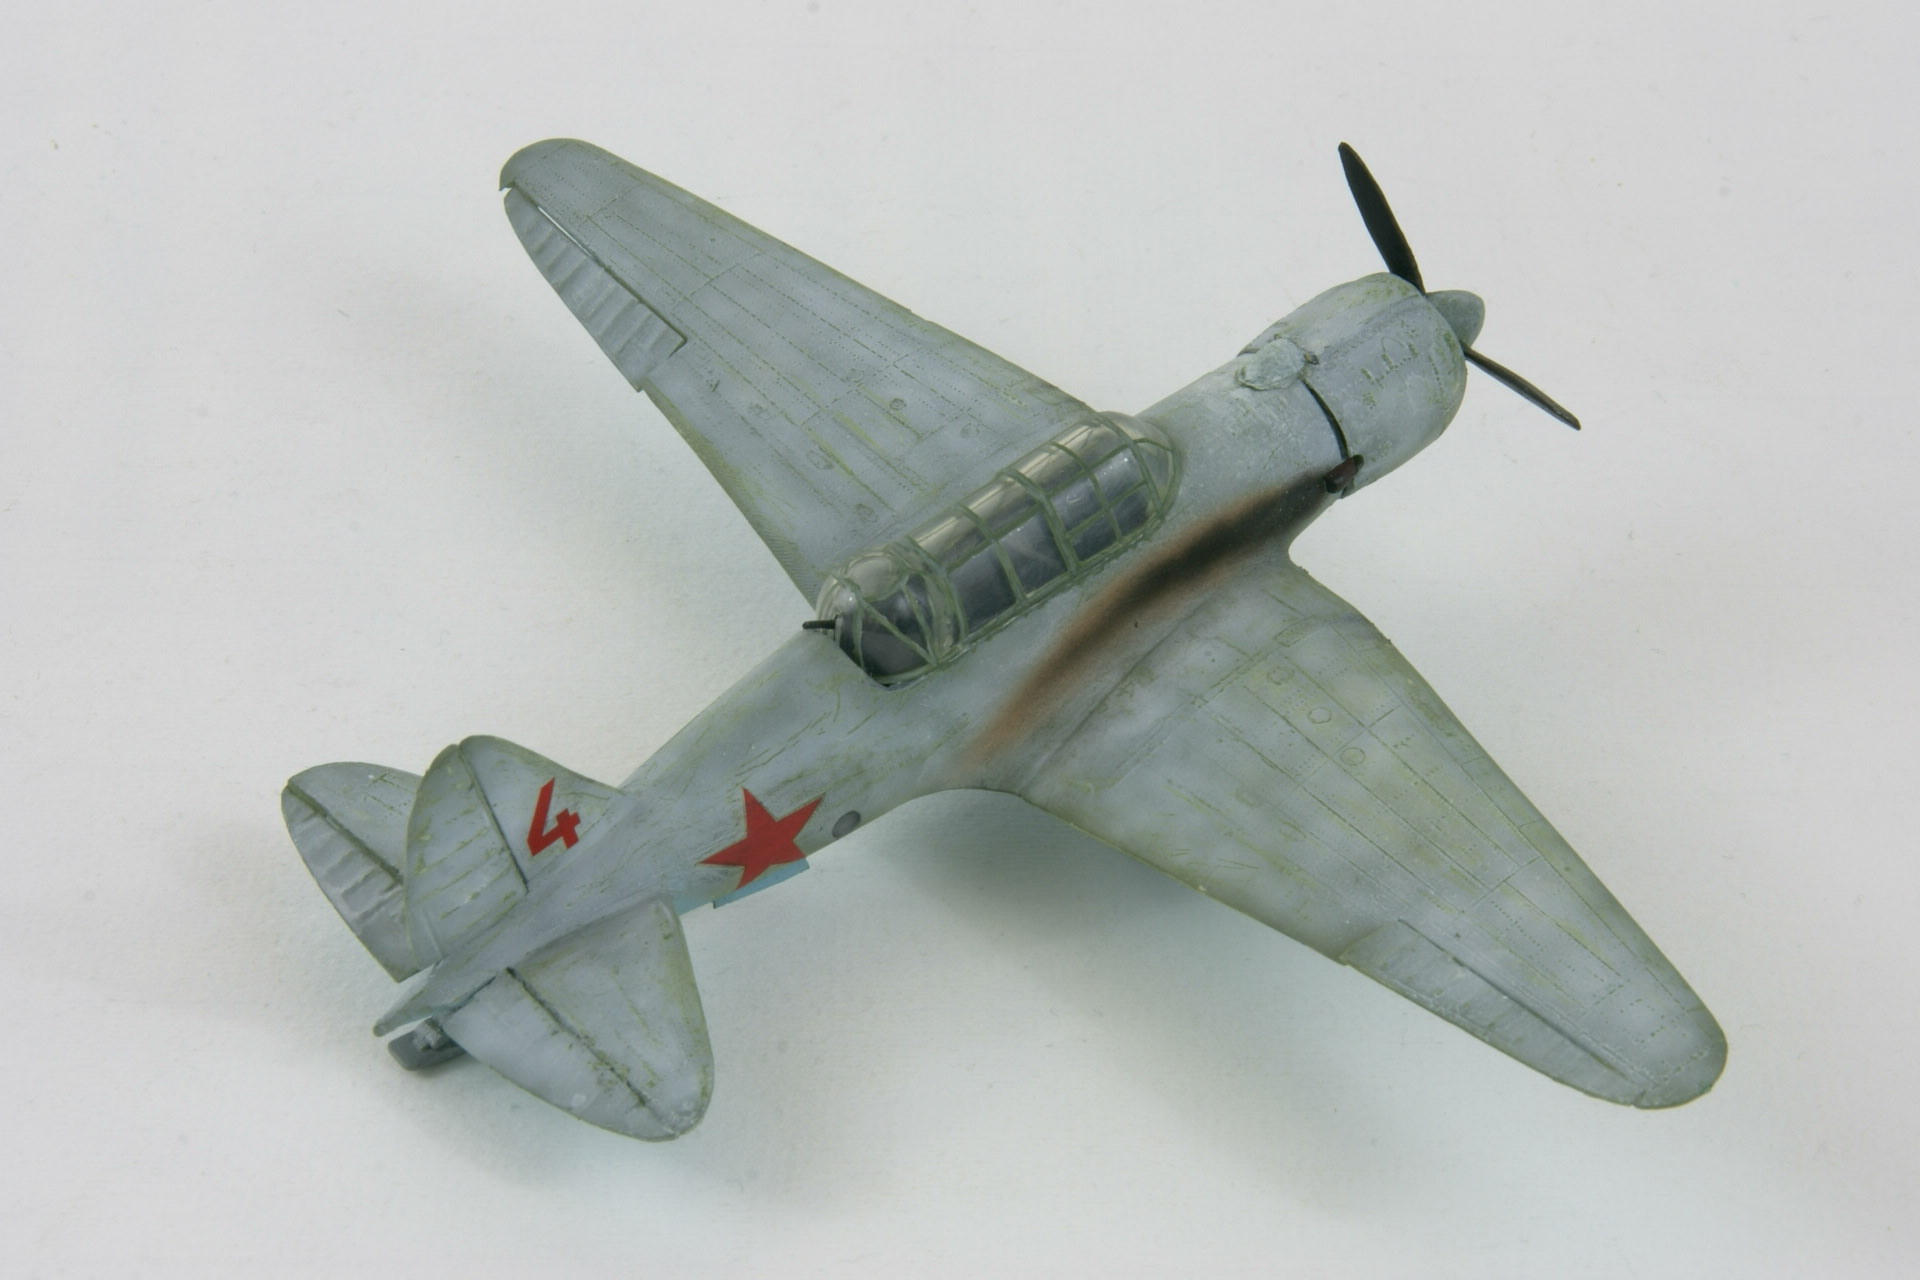 Sukhoi 2m 82 3 1